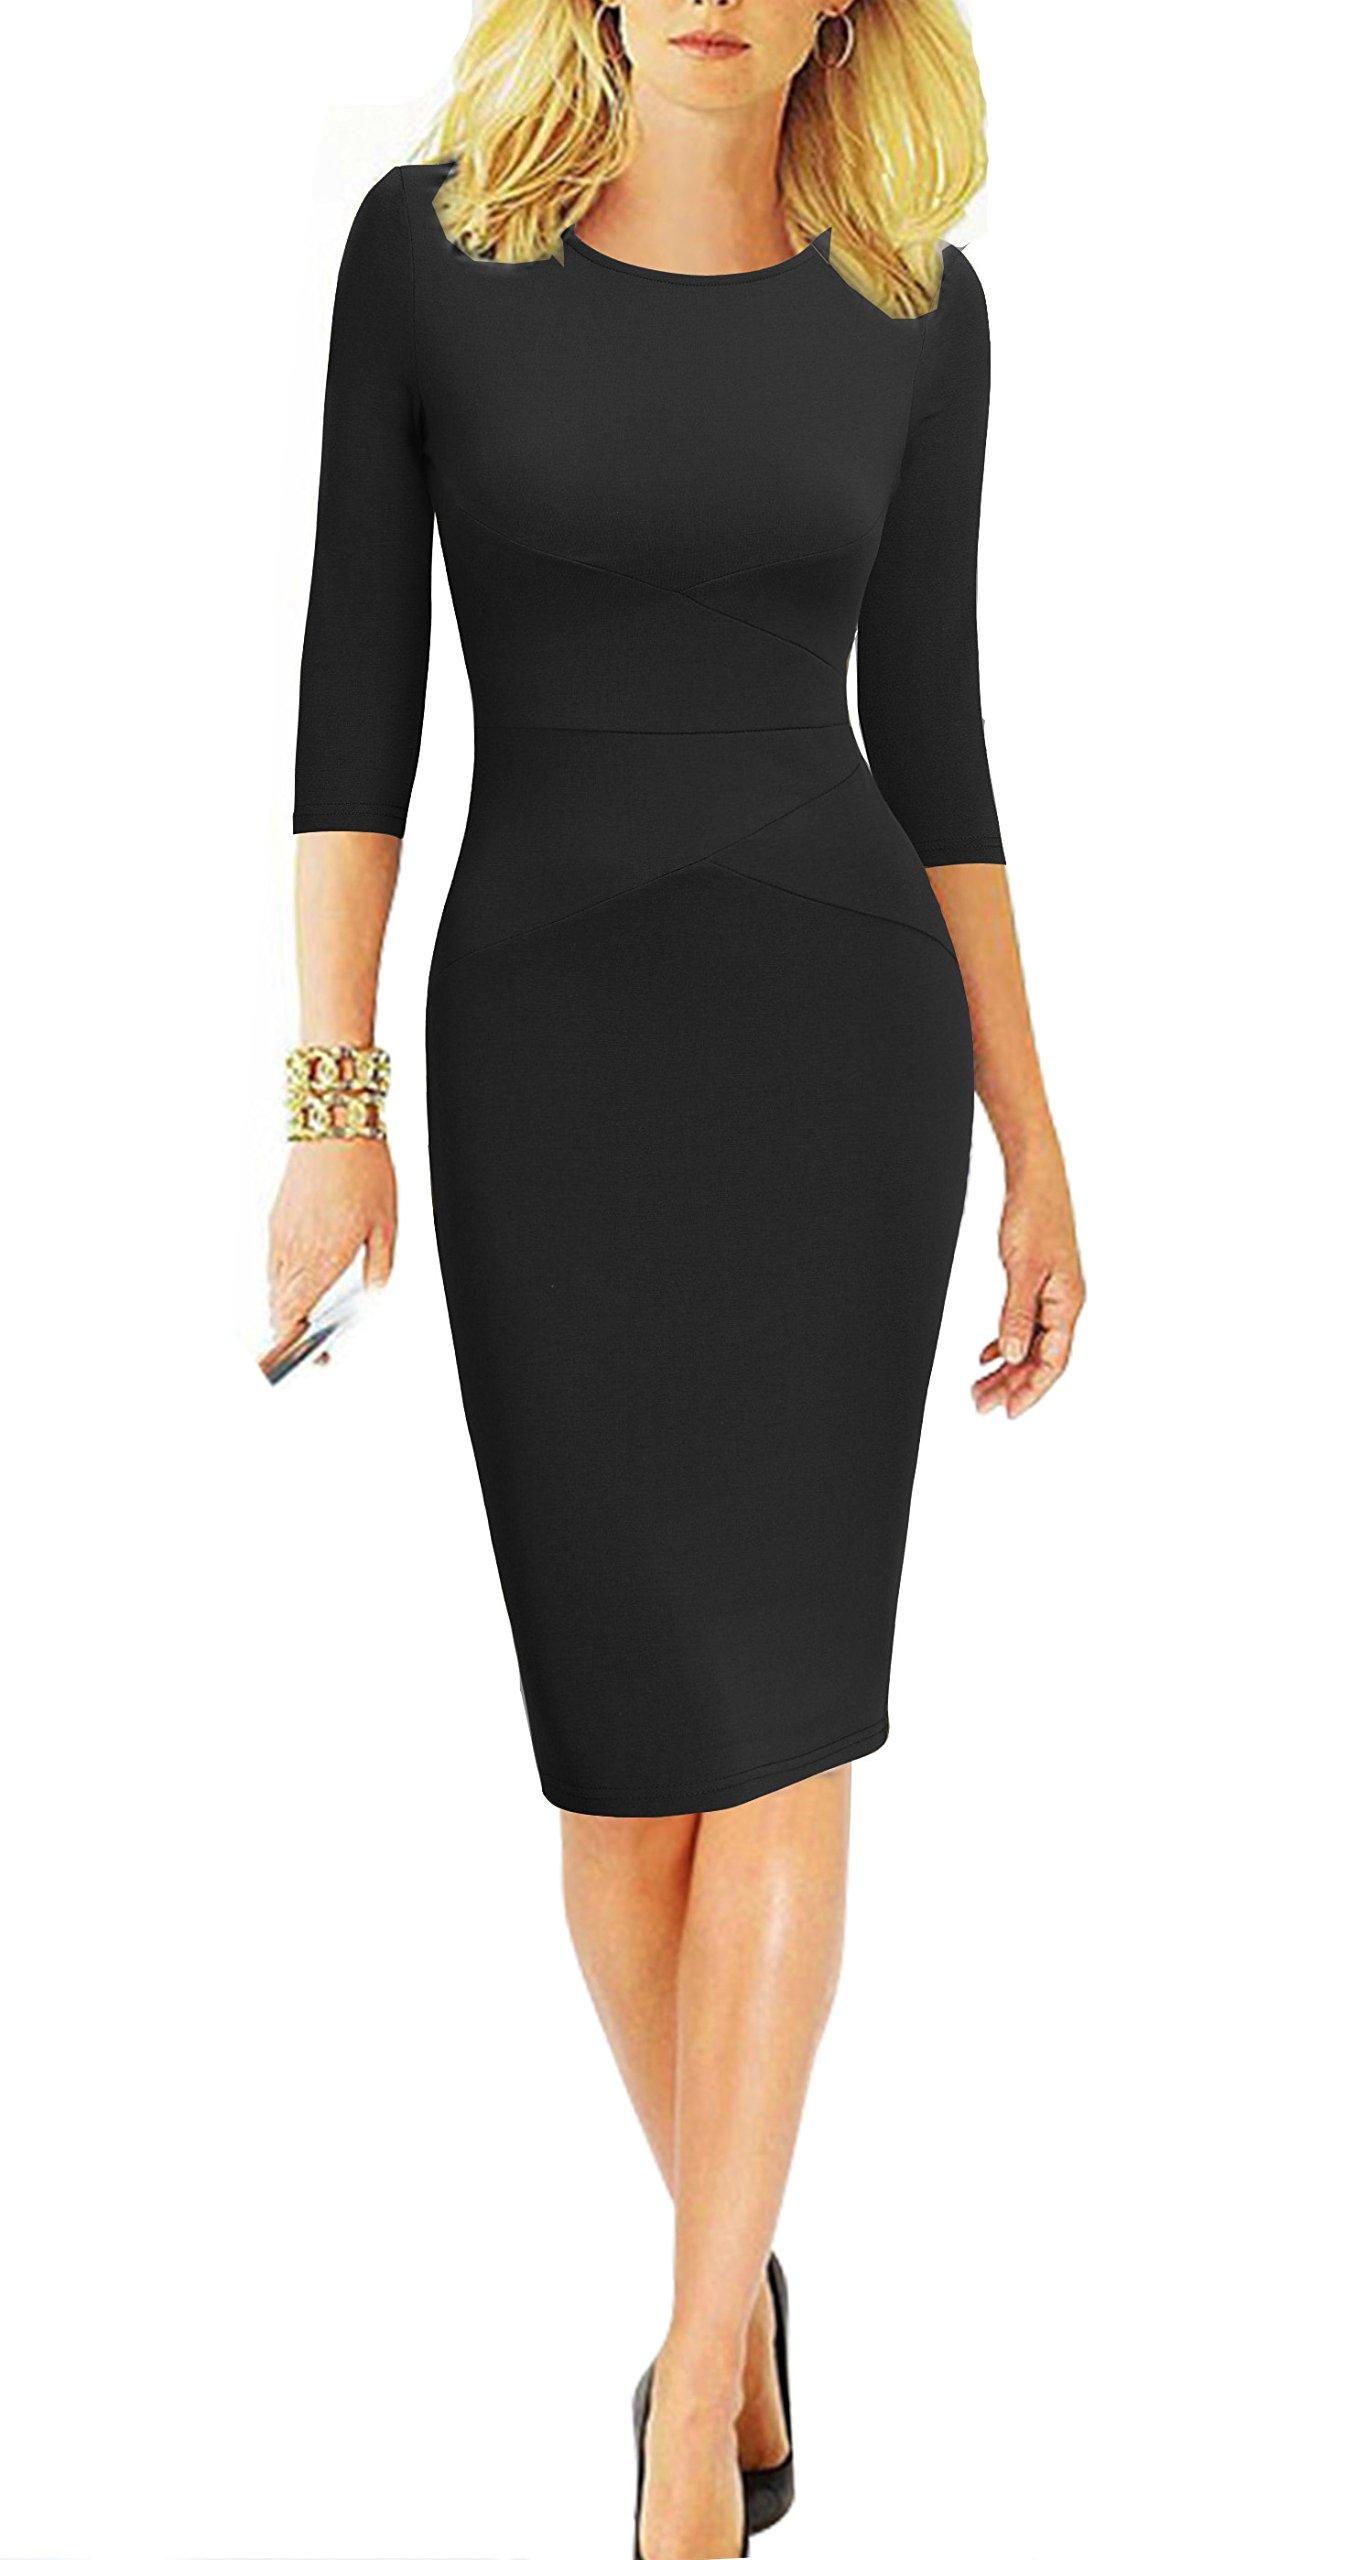 REPHYLLIS Women 3/4 Sleeve Striped Wear to Work Business Cocktail Pencil Dress (Medium, Pure Black)